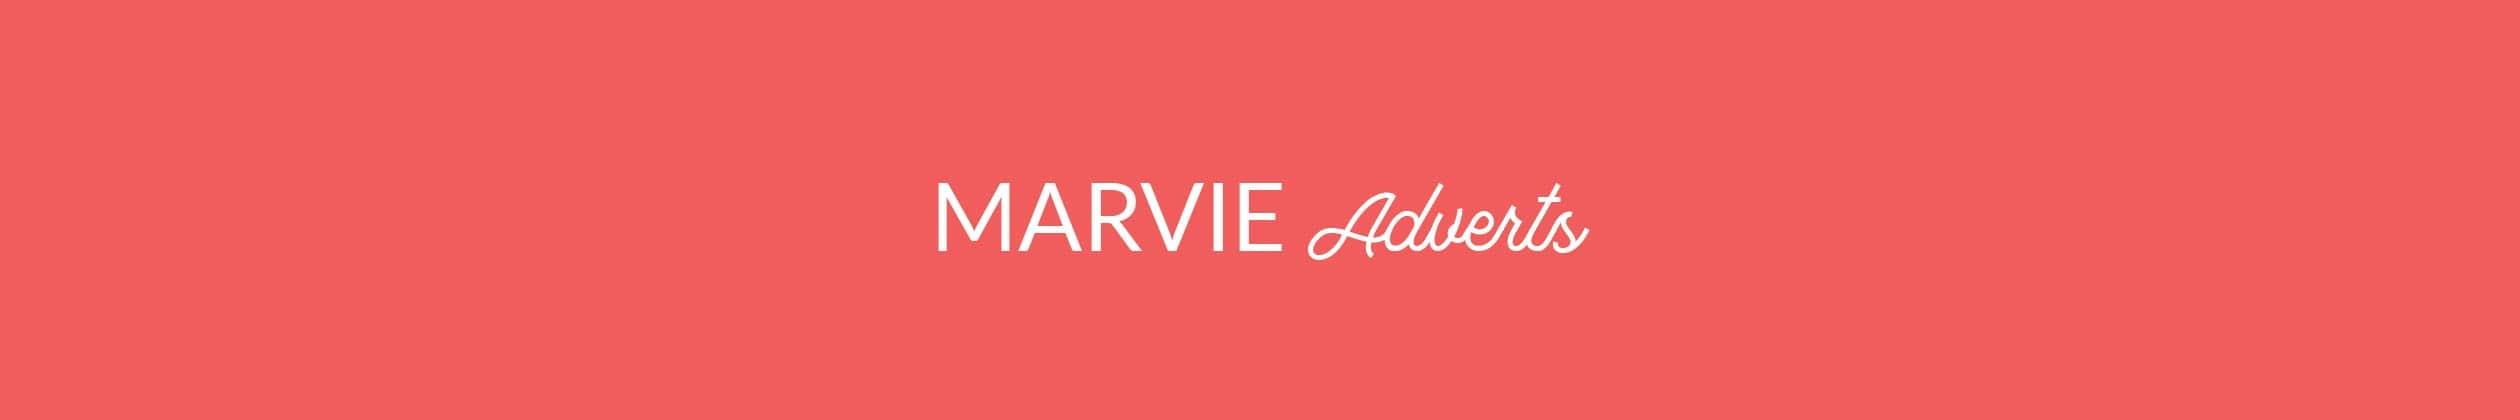 marvie-04